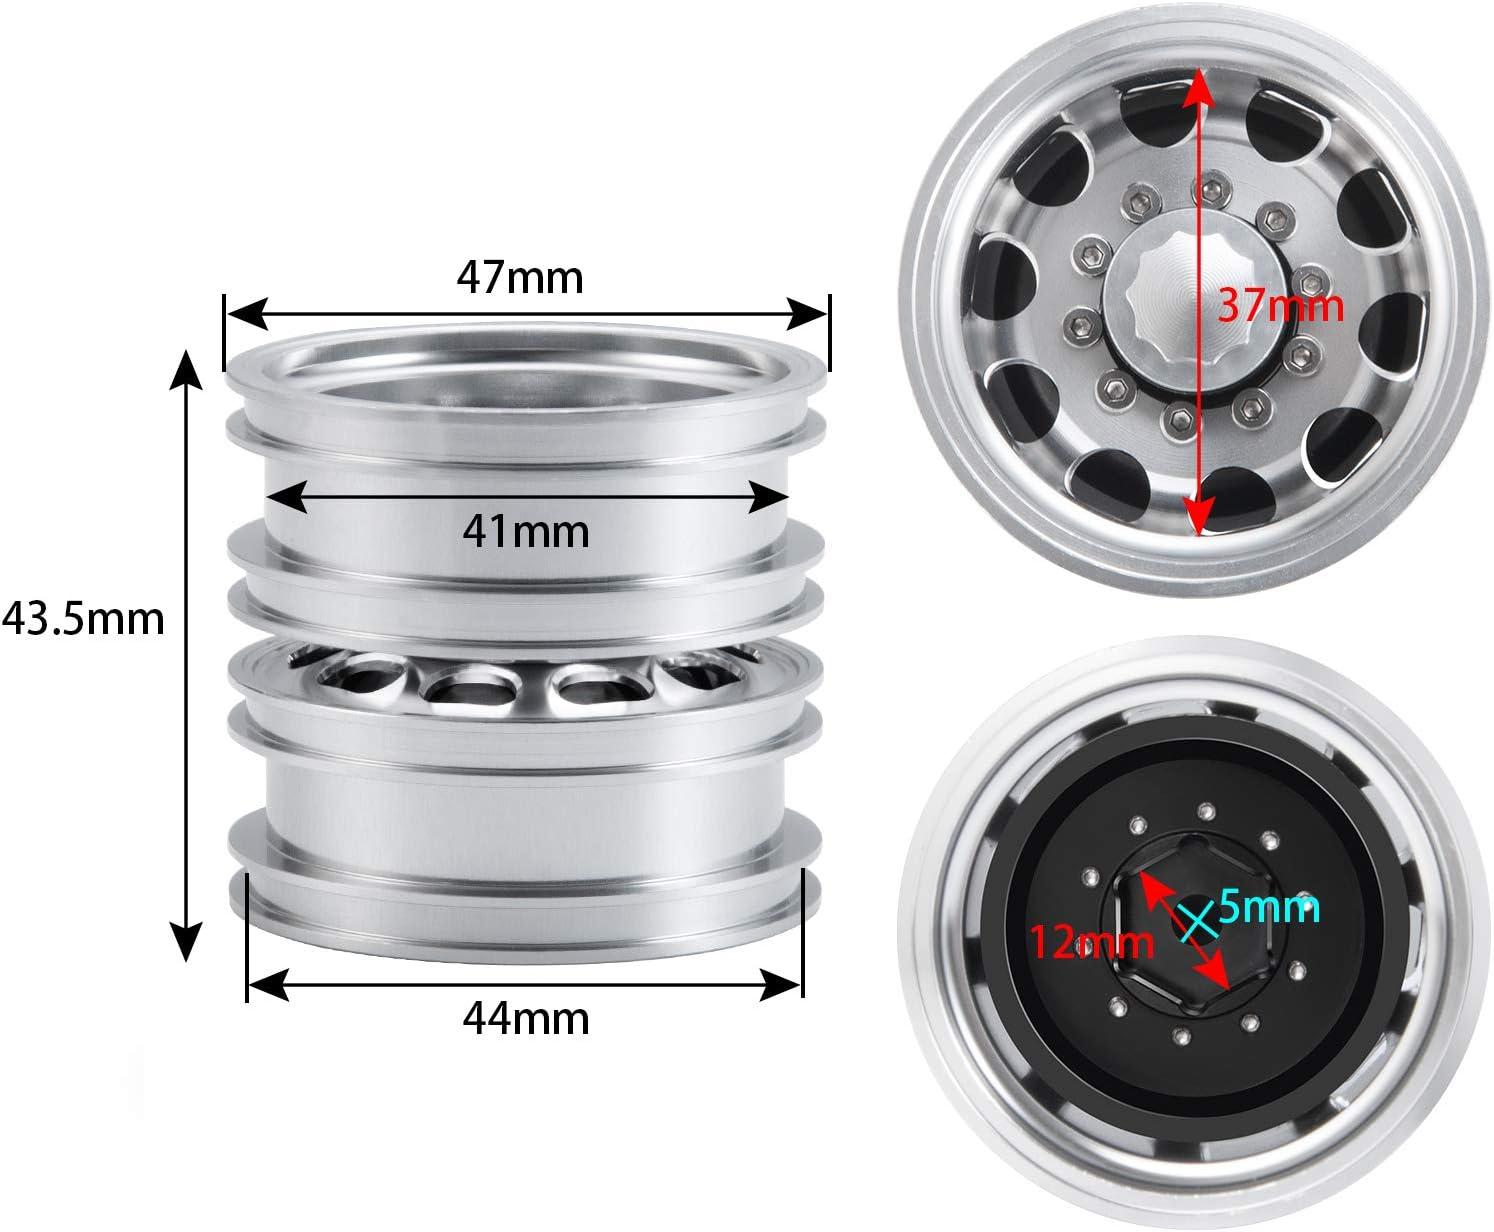 AXspeed 4pcs Metal Rear Wheel Rims Wheel Hubs for 1:14 Tamiya Trailer Tractor Truck RC Car